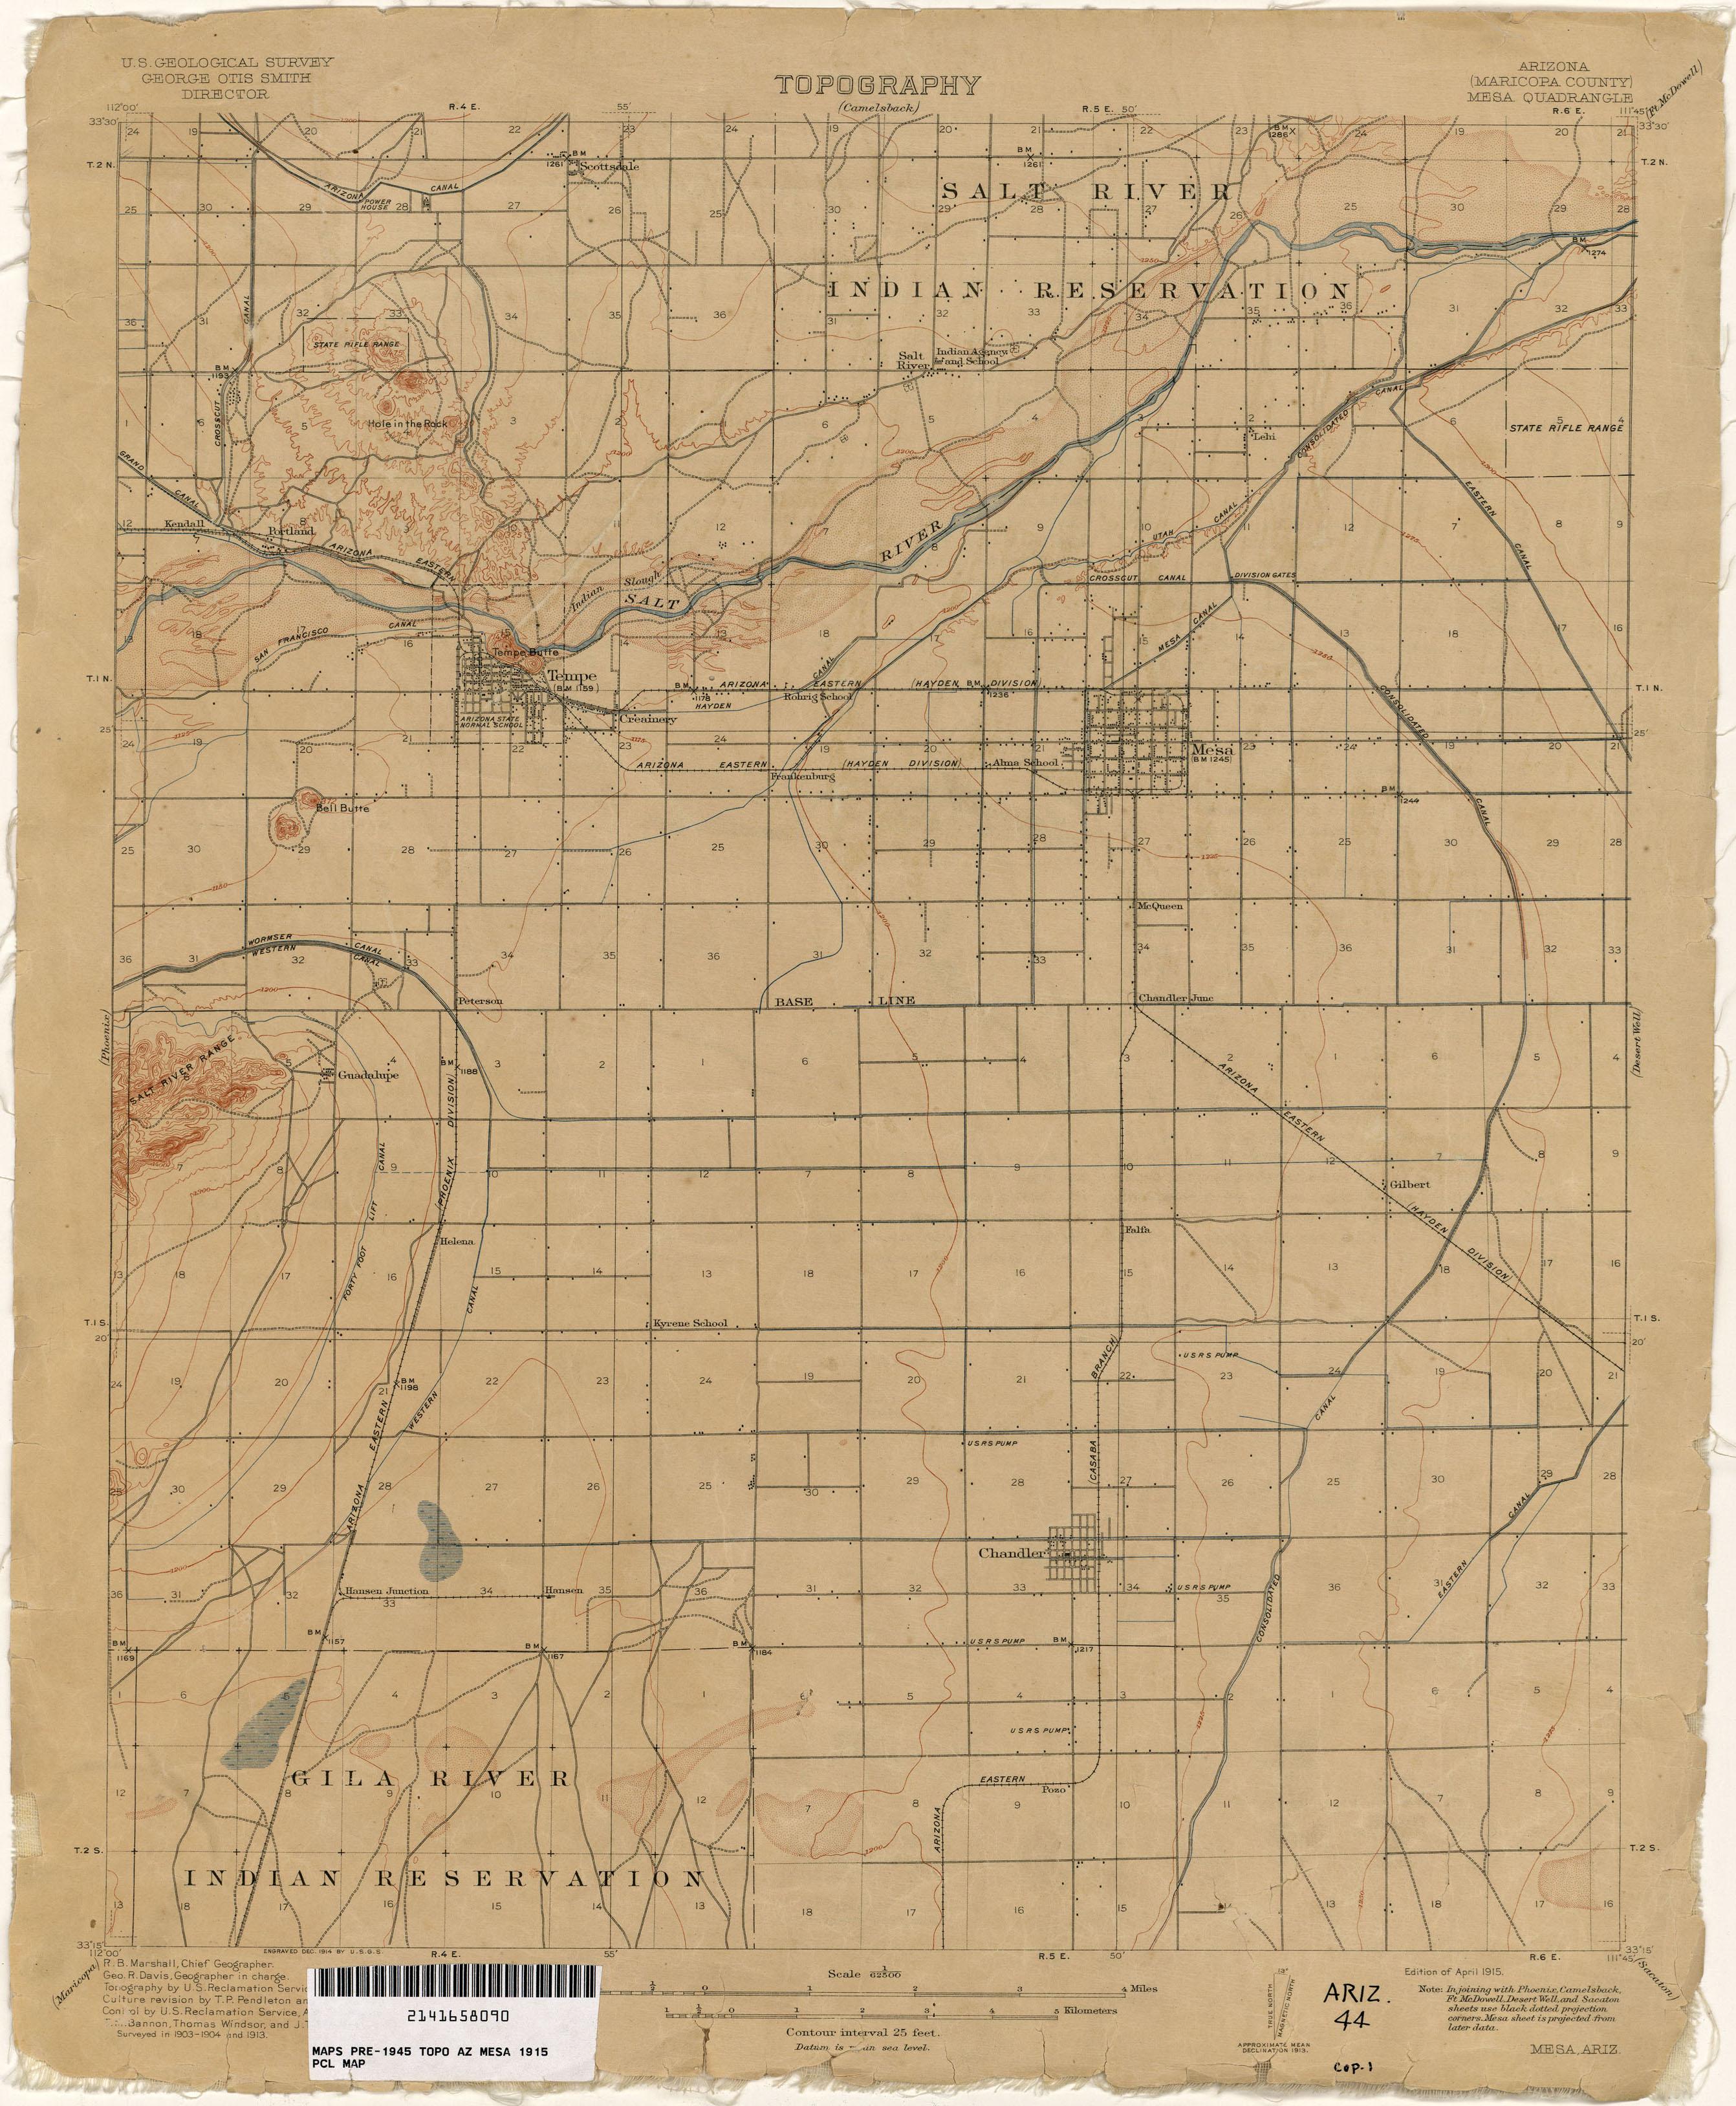 Arizona Historical Topographic Maps - Perry-Castañeda Map Collection on map of waianae hi, map of naco az, map of arizona, map of petrified forest az, map of prescott az, map of cochise az, map of pinedale az, map of christopher creek az, map of valle az, map of stanfield az, map of phoenix az, map of portal az, map of santa cruz county az, map of black canyon city az, map of sun city grand az, map of nutrioso az, map of colorado river az, map of gila river az, map of fort mcdowell az, map of tacna az,